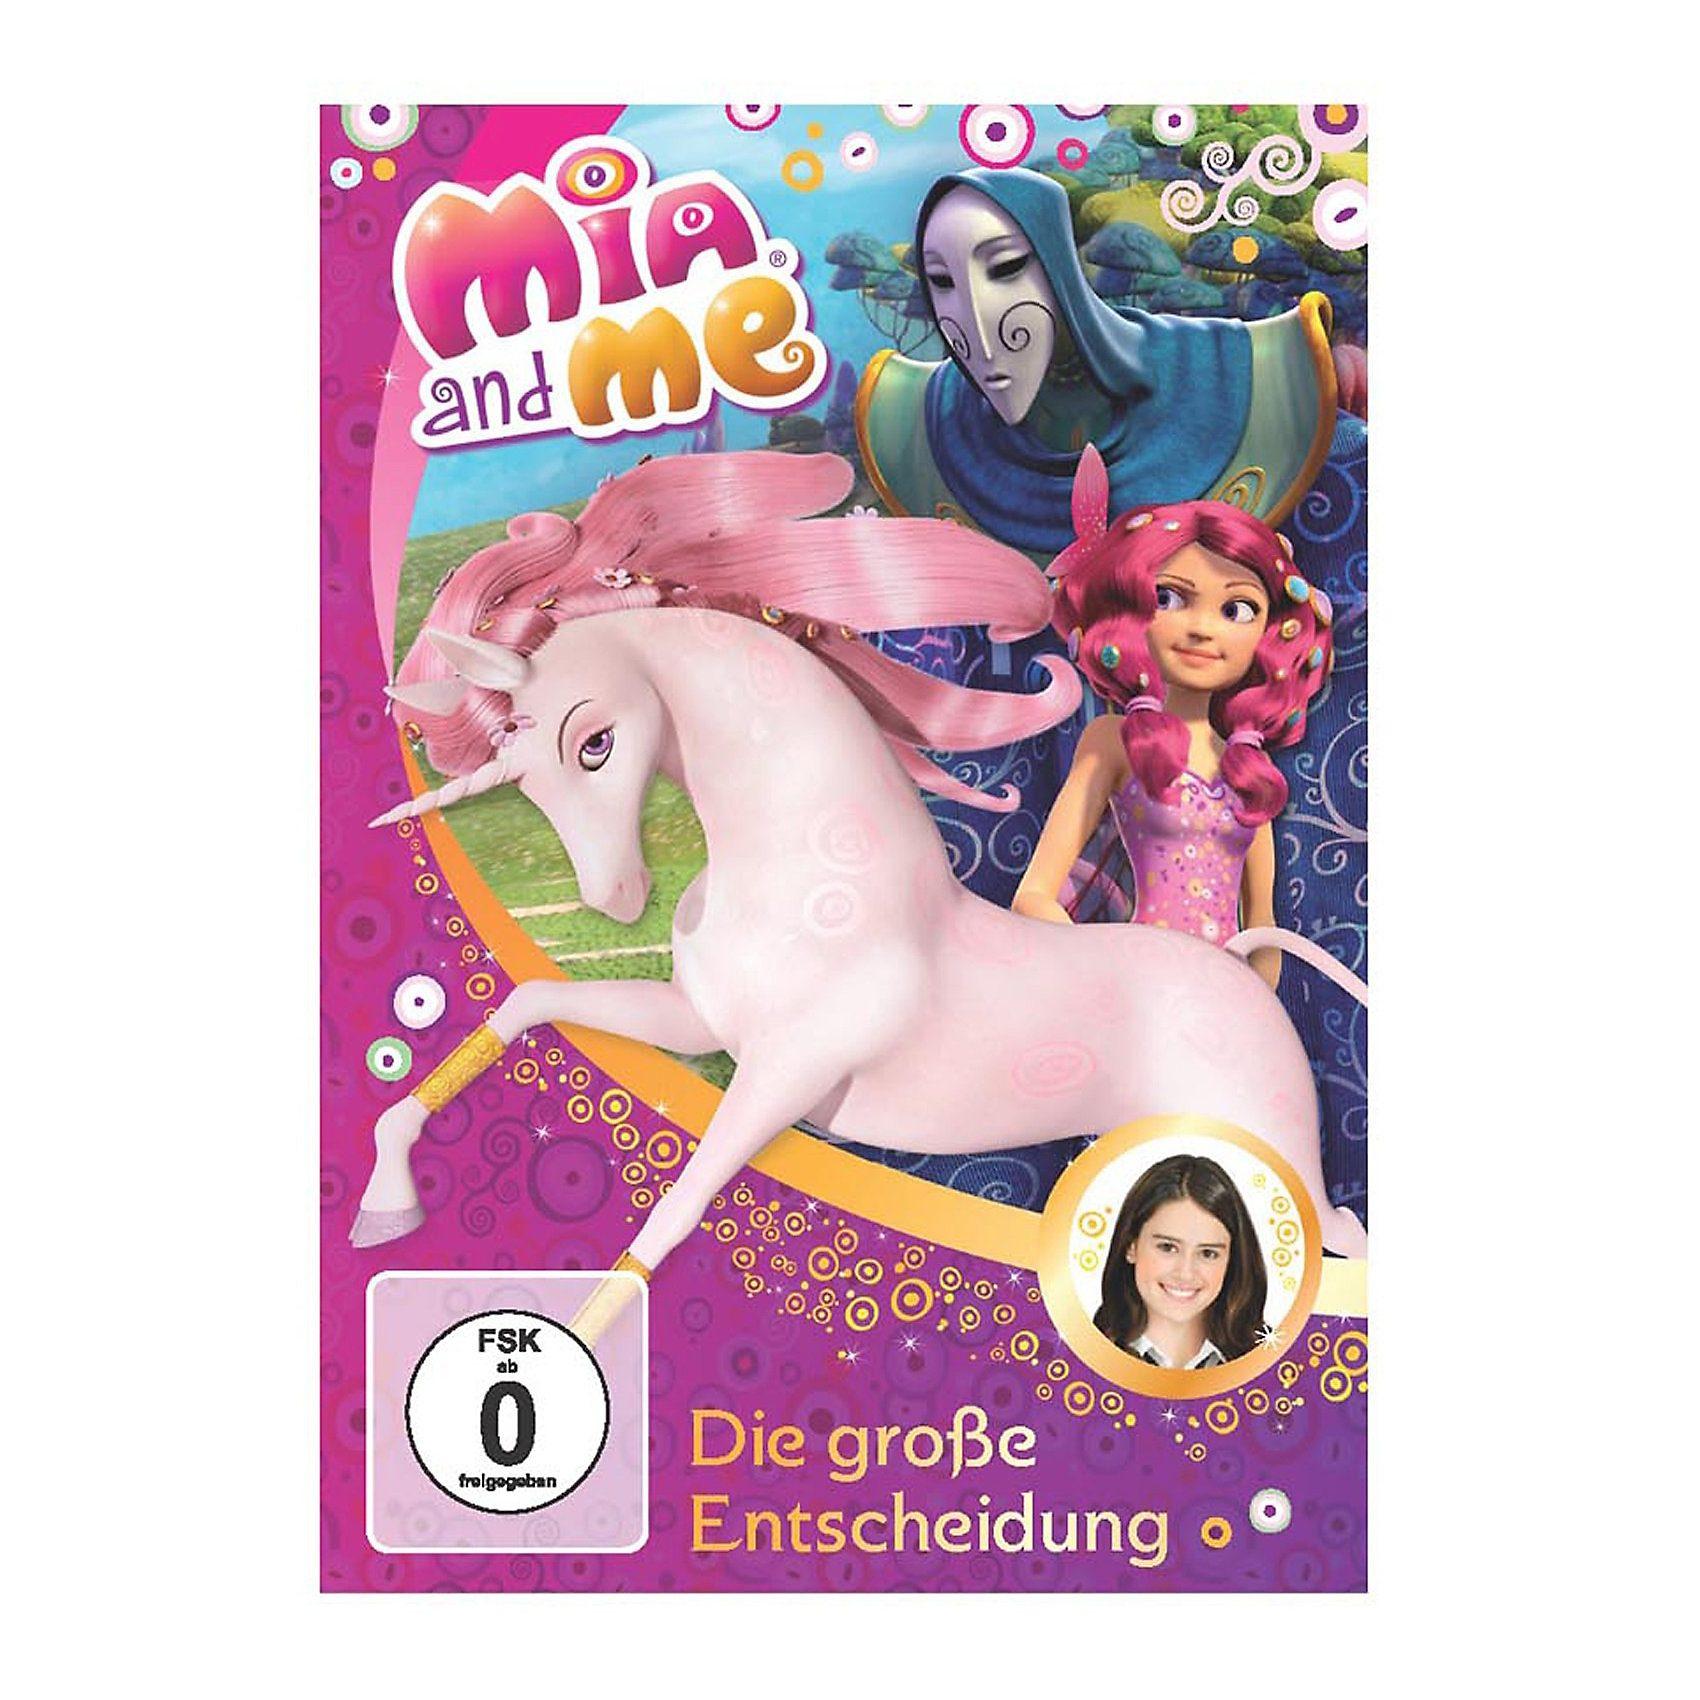 Edel Germany GmbH DVD Mia and me 13 - Die große Entscheidung